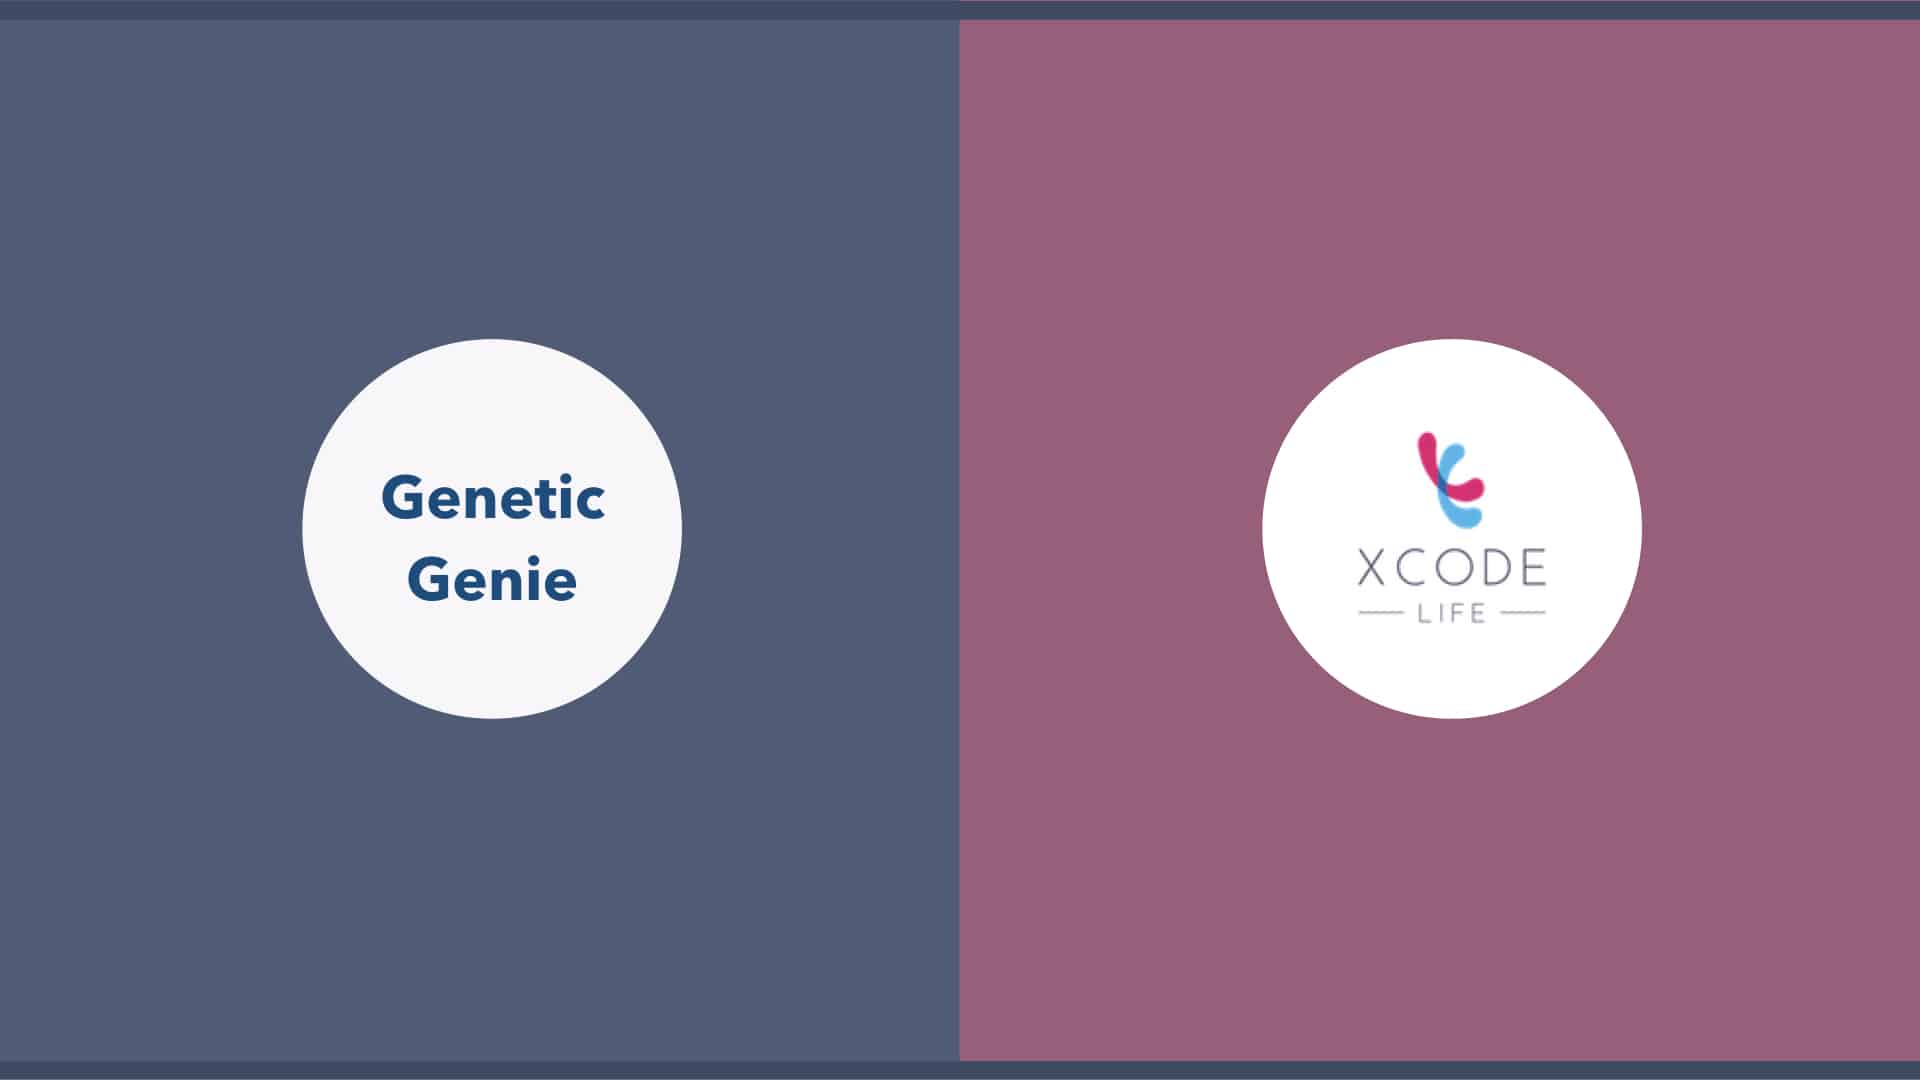 Genetic genie MTHFR DNA raw data analysis third party tool